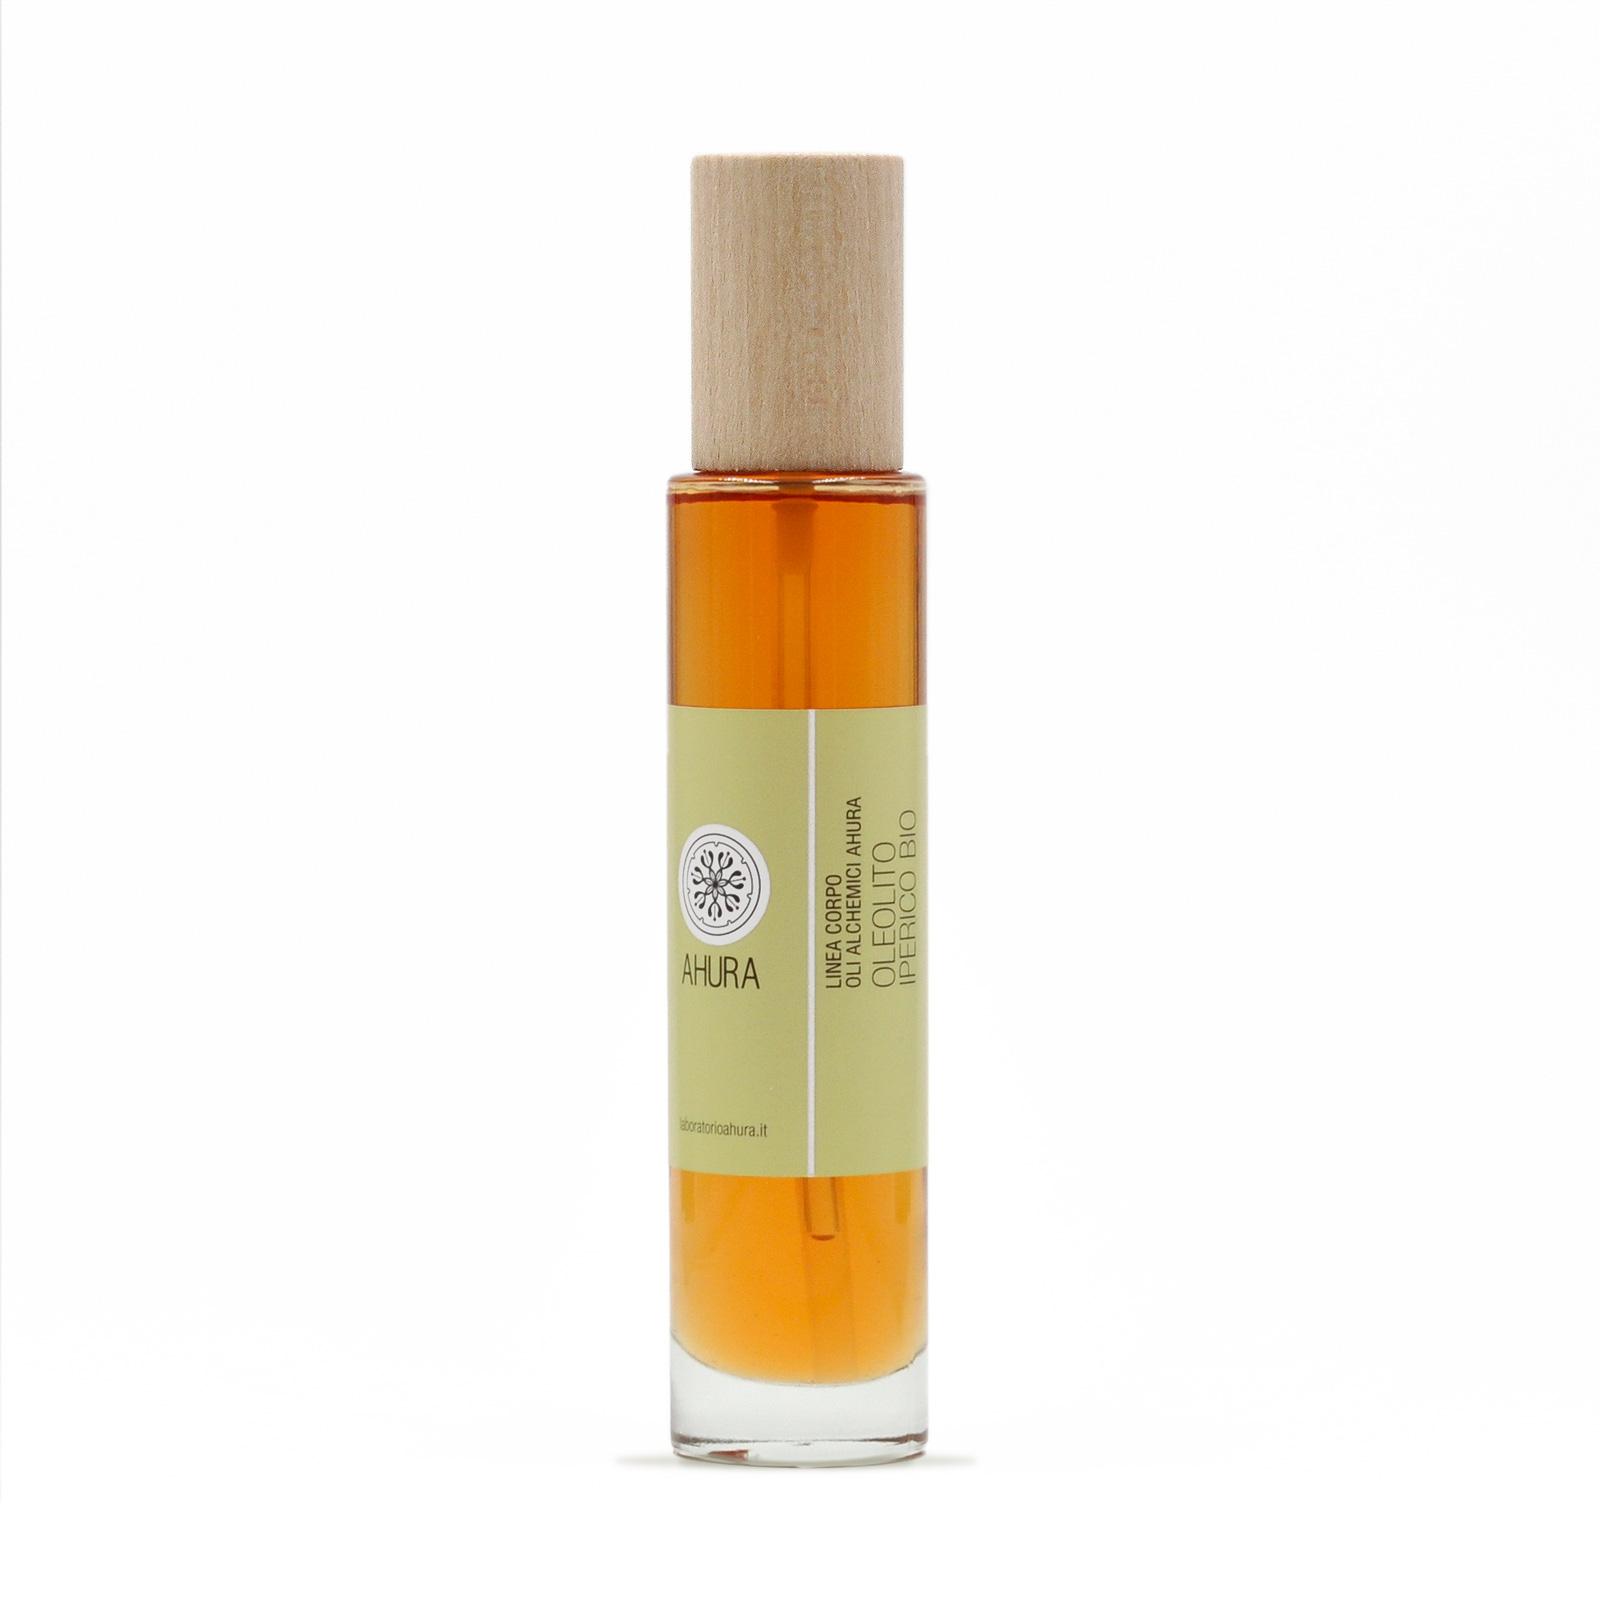 A0004 olio alchemico iperico bio 01 - Ahura